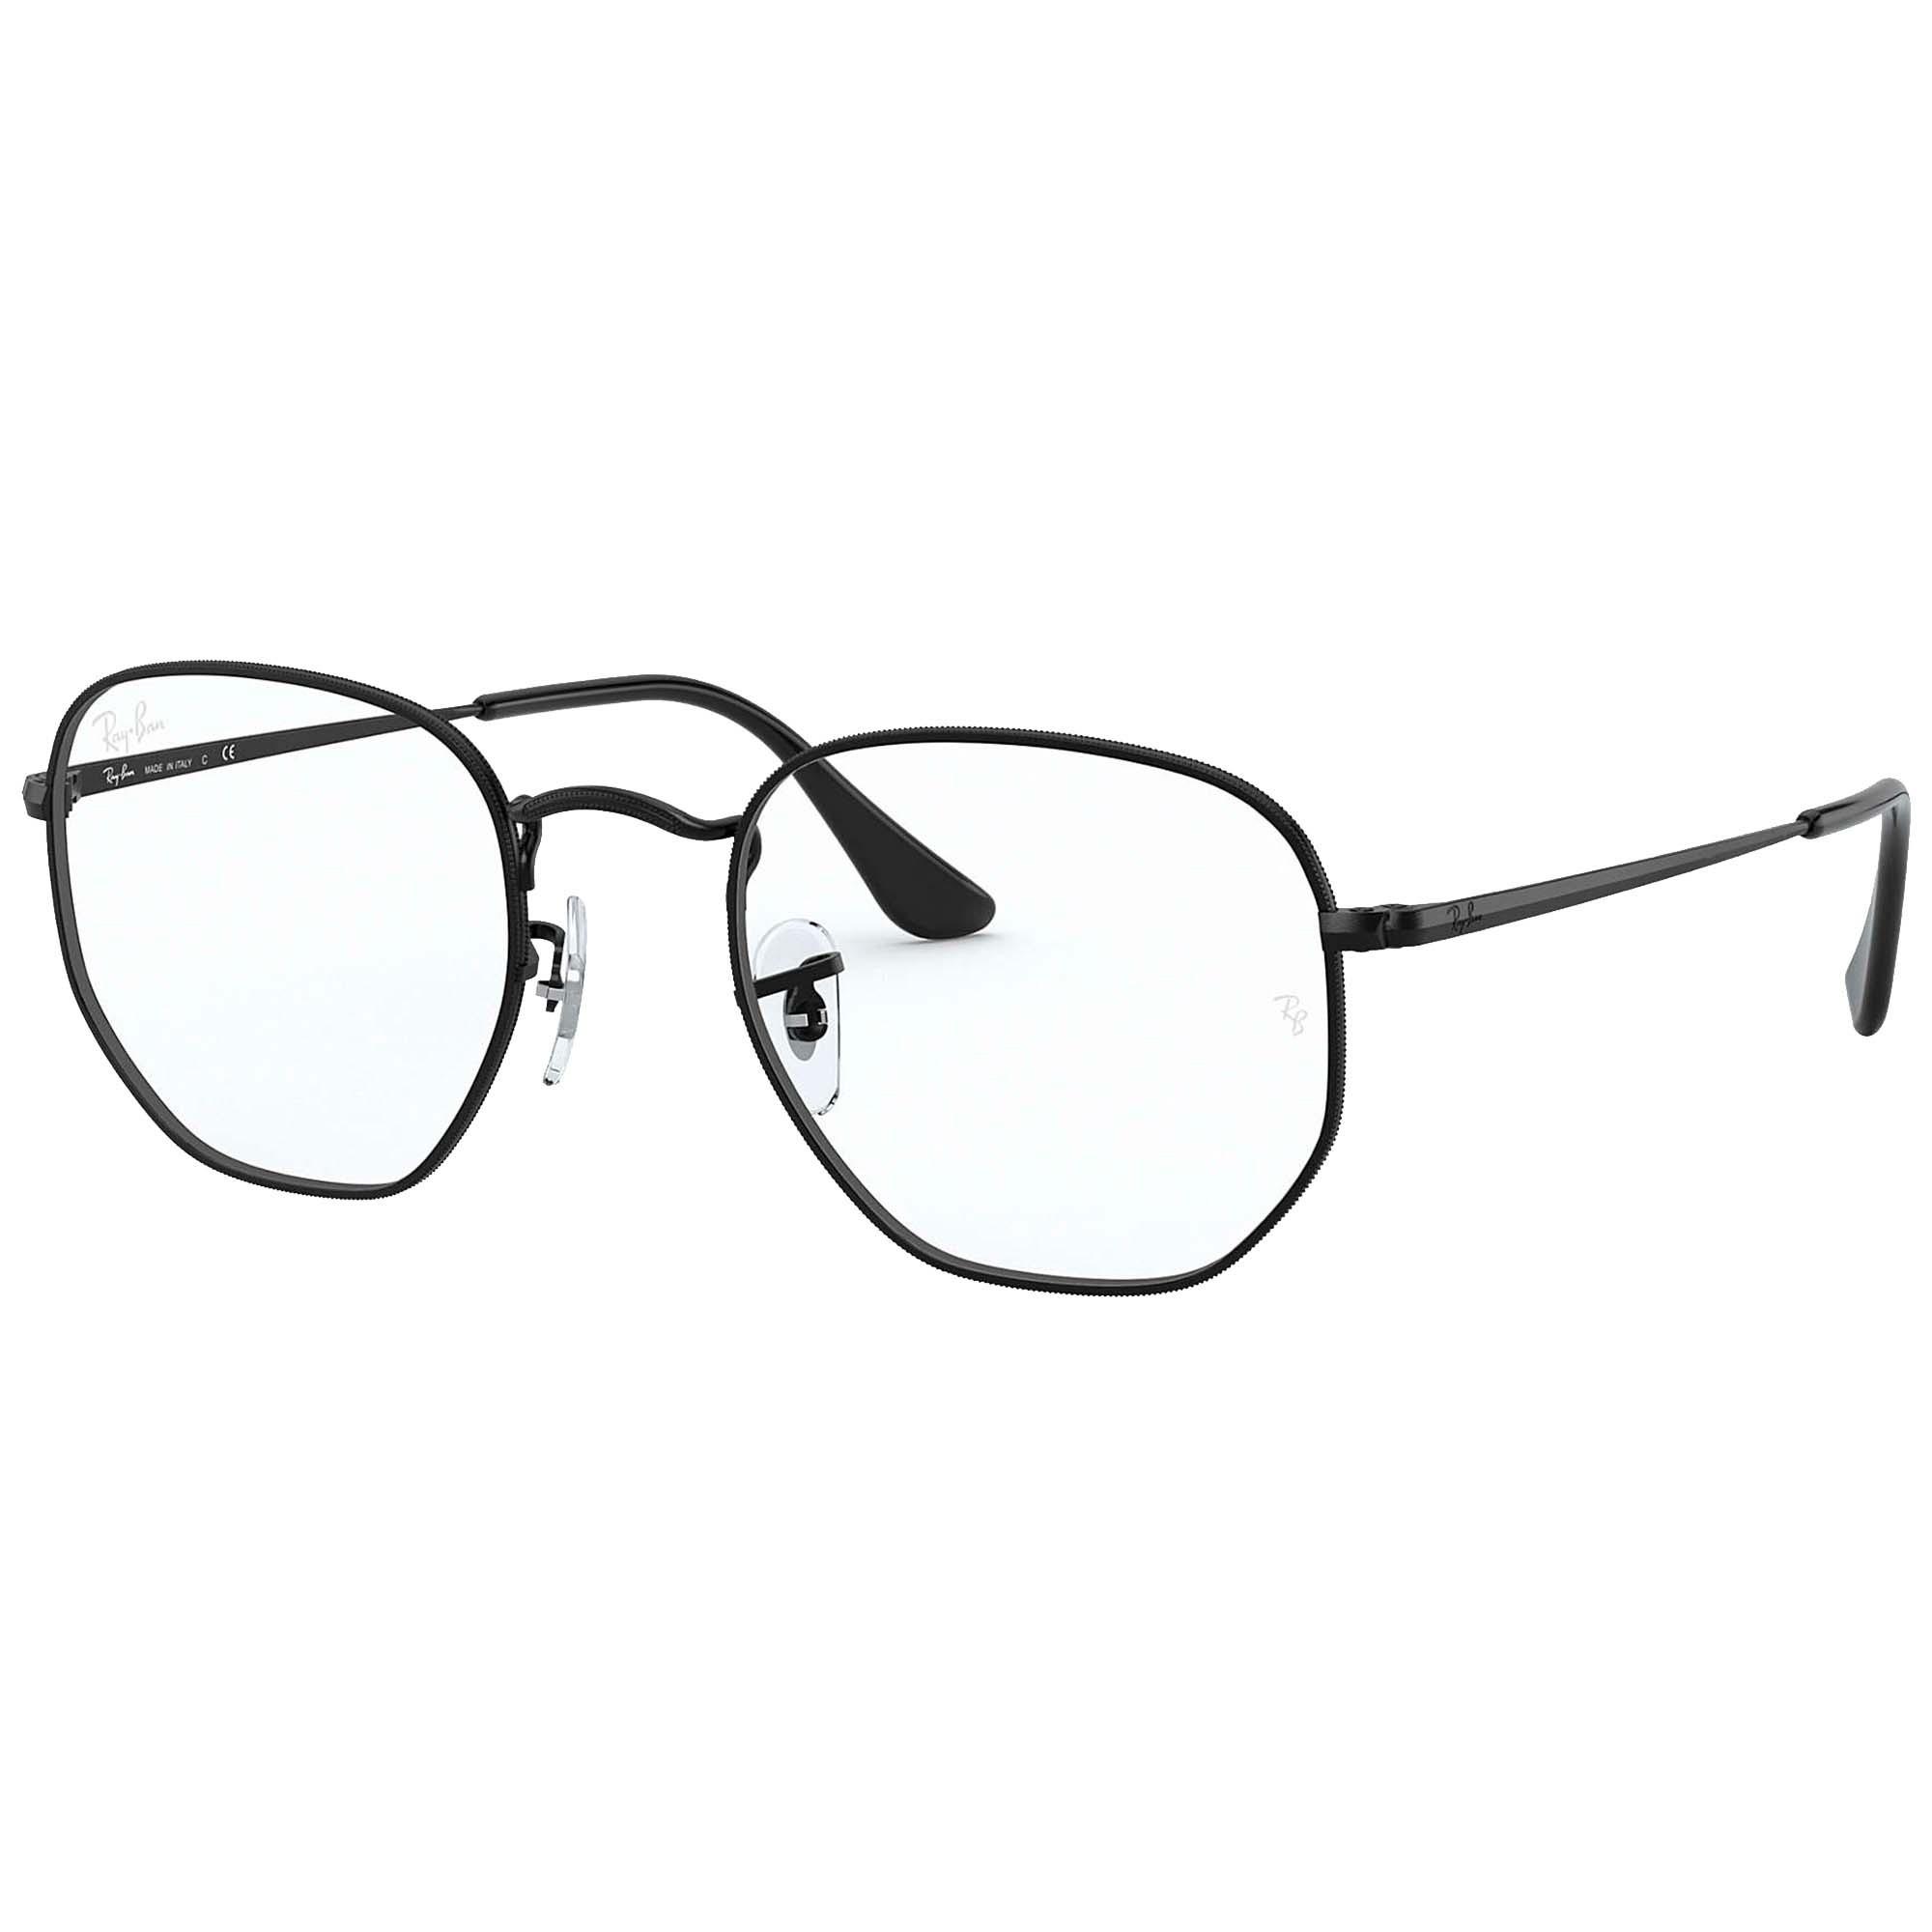 Óculos de Grau Unissex Ray-Ban Hexagonal Optics RB6448 2509 54-21